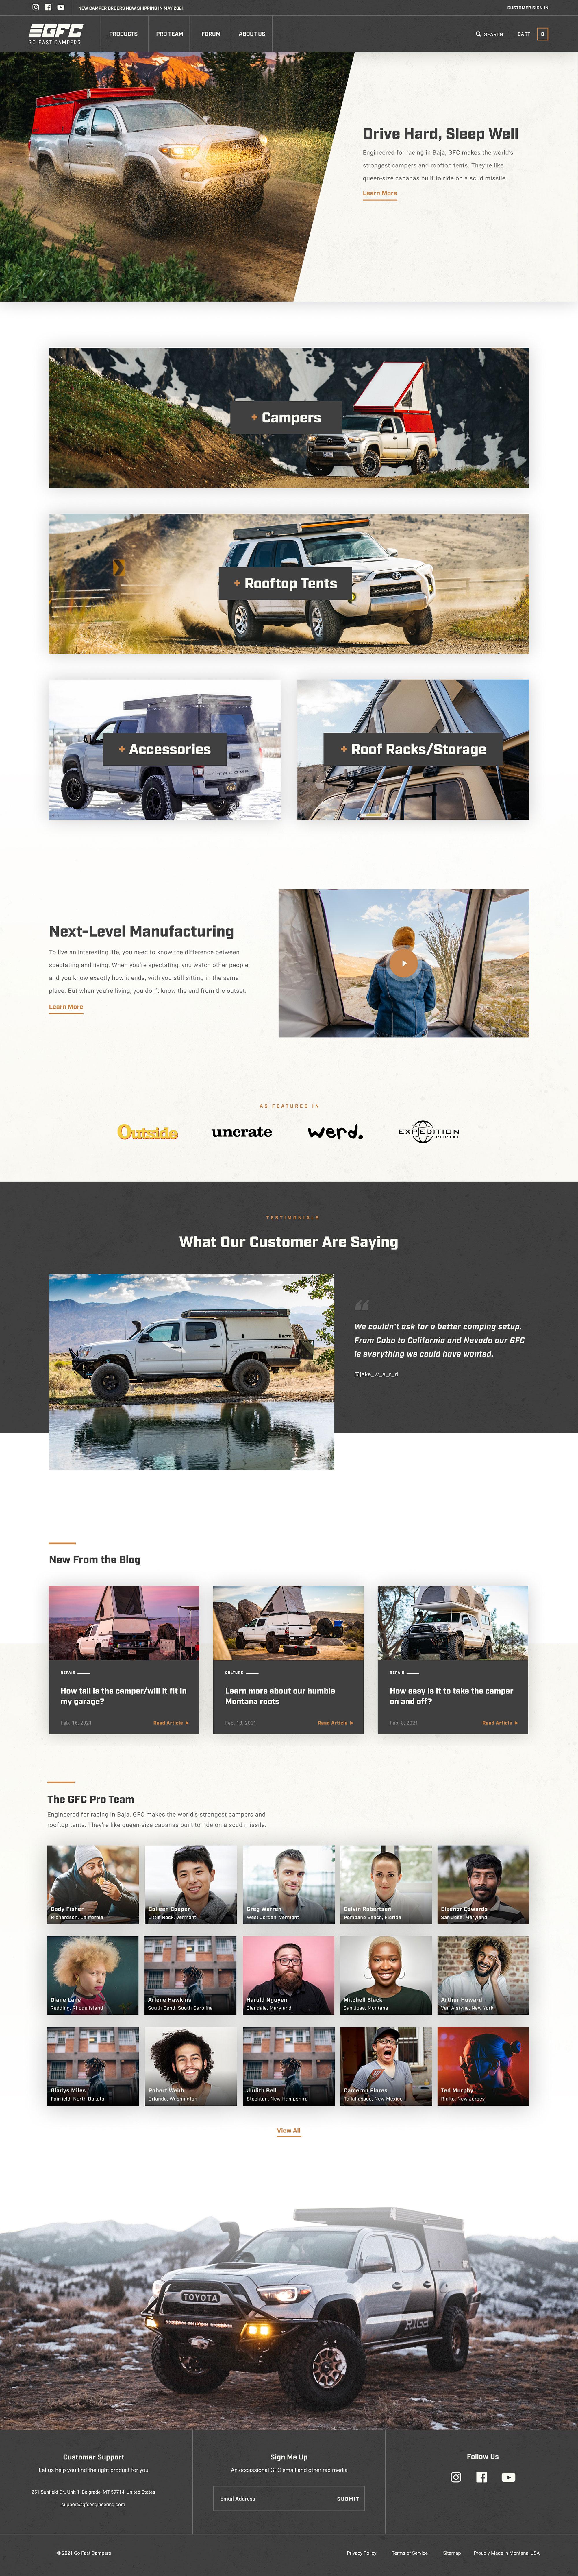 Raymond Lombardi design that features Michelle Allen website design.